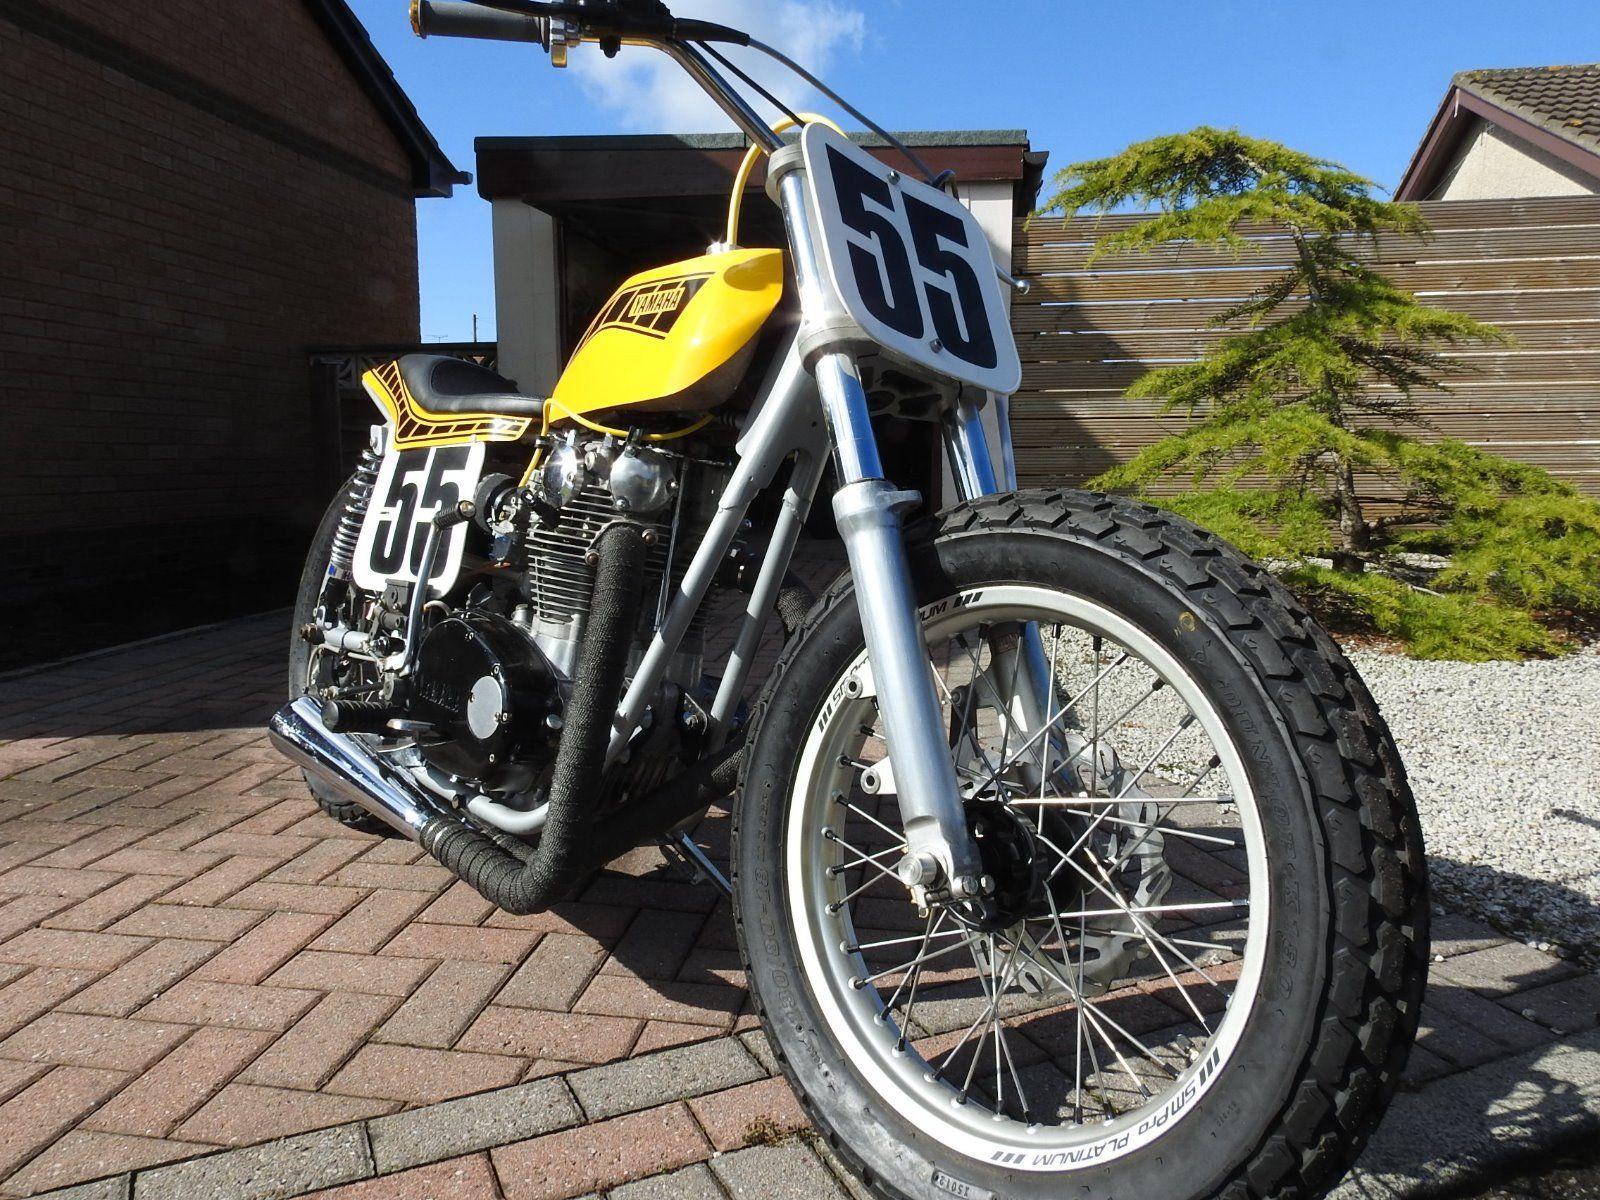 Sideblog Yamaha Xs650 Big Bore For Sale